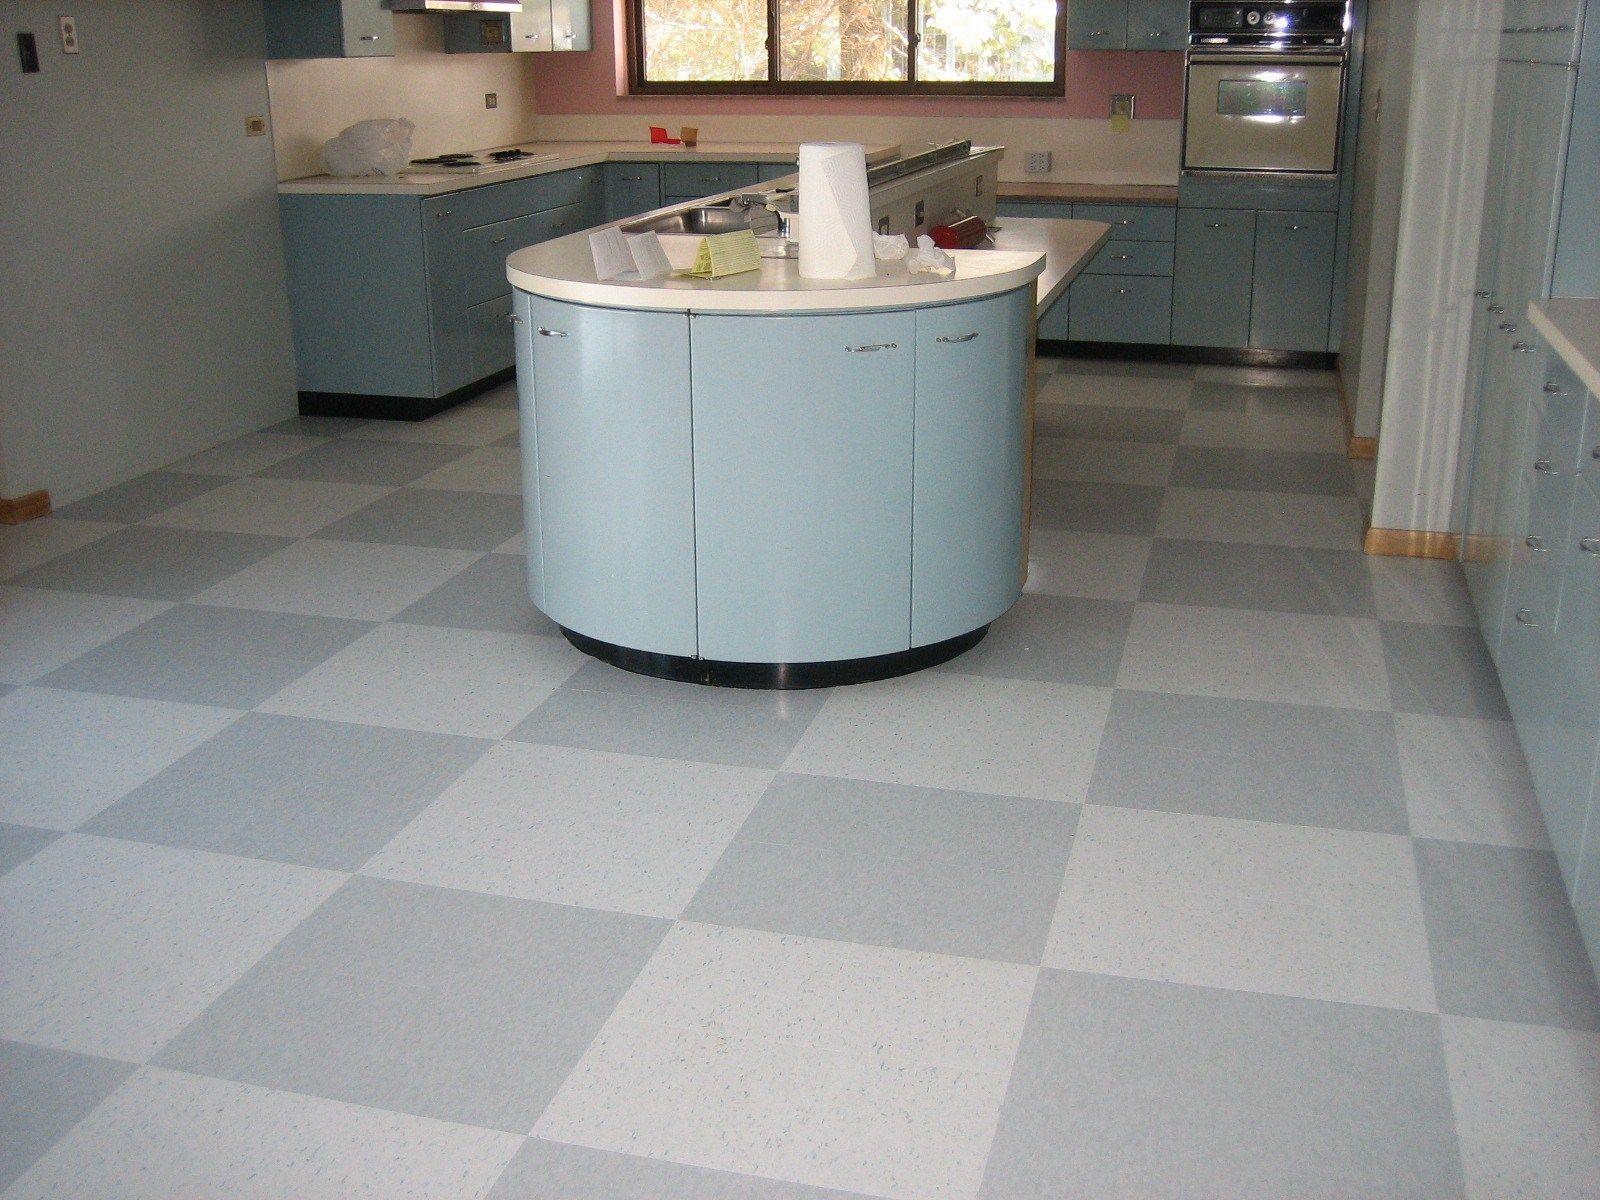 Granite Tiles Design - Suitable for Bathroom and Kitchen Floors ...